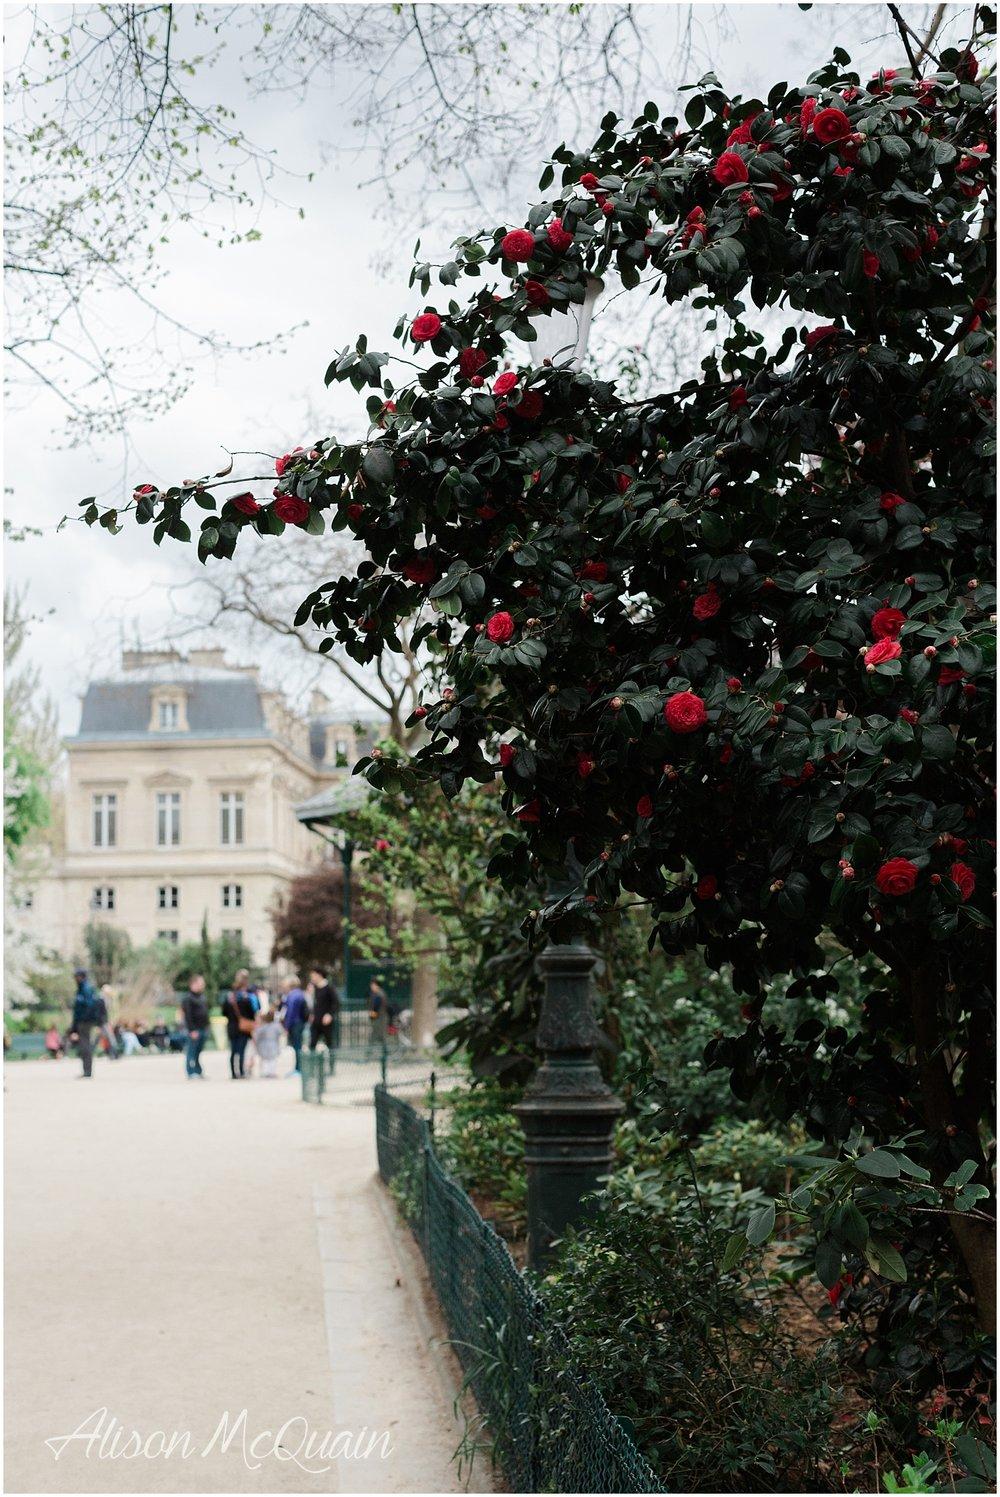 France_Paris_Marseille_Cassis_alisonmcquainphtography2018-04-27_0016.jpg